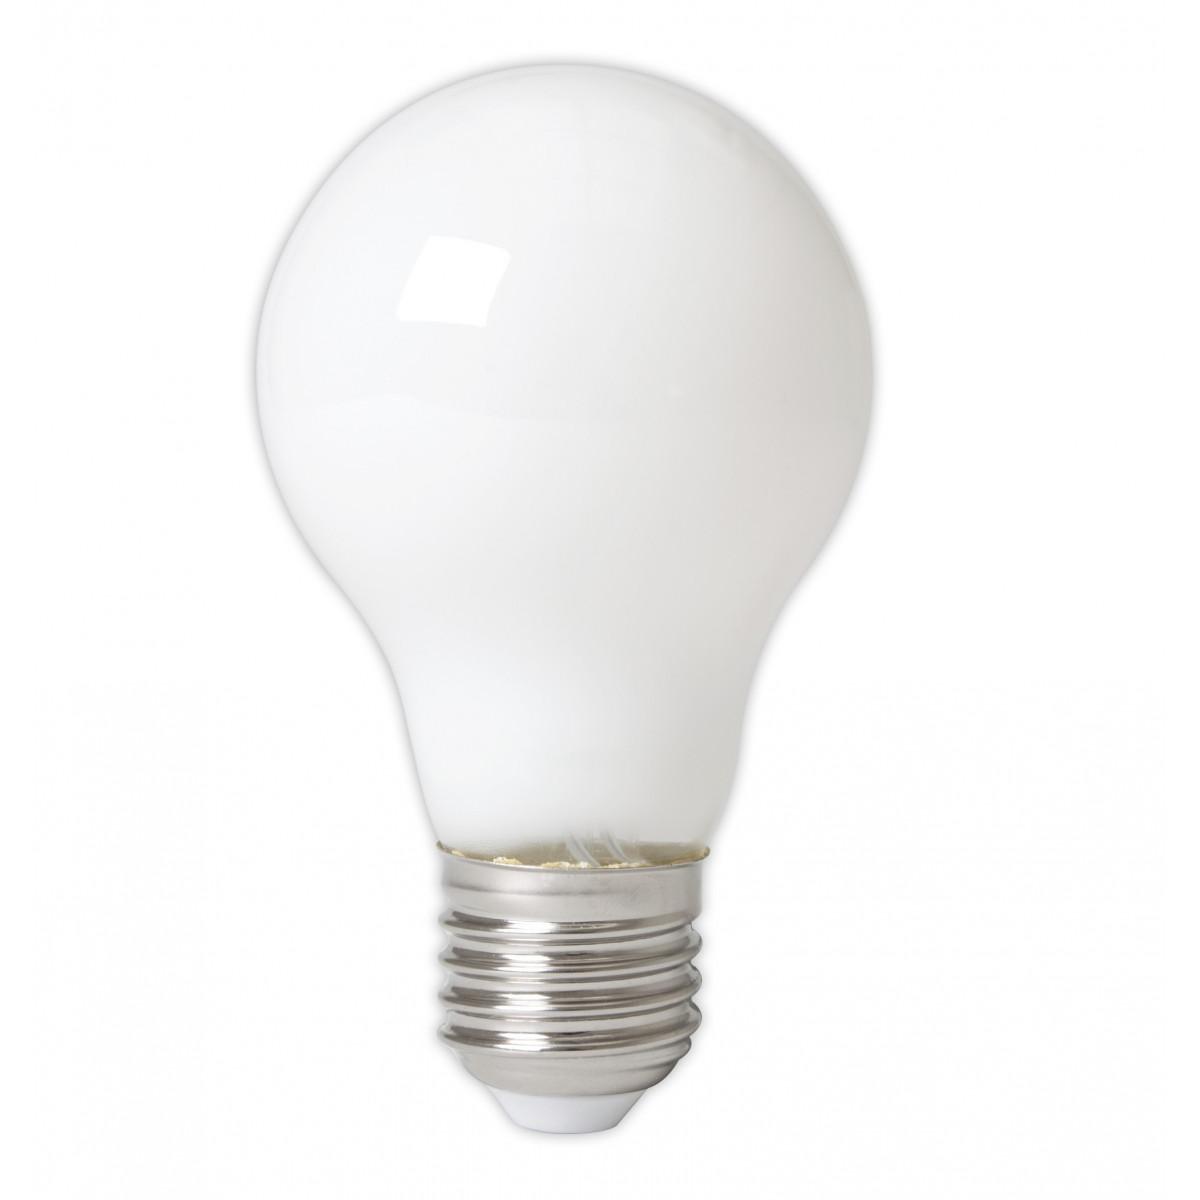 LED GLS E27 Lampe Matt